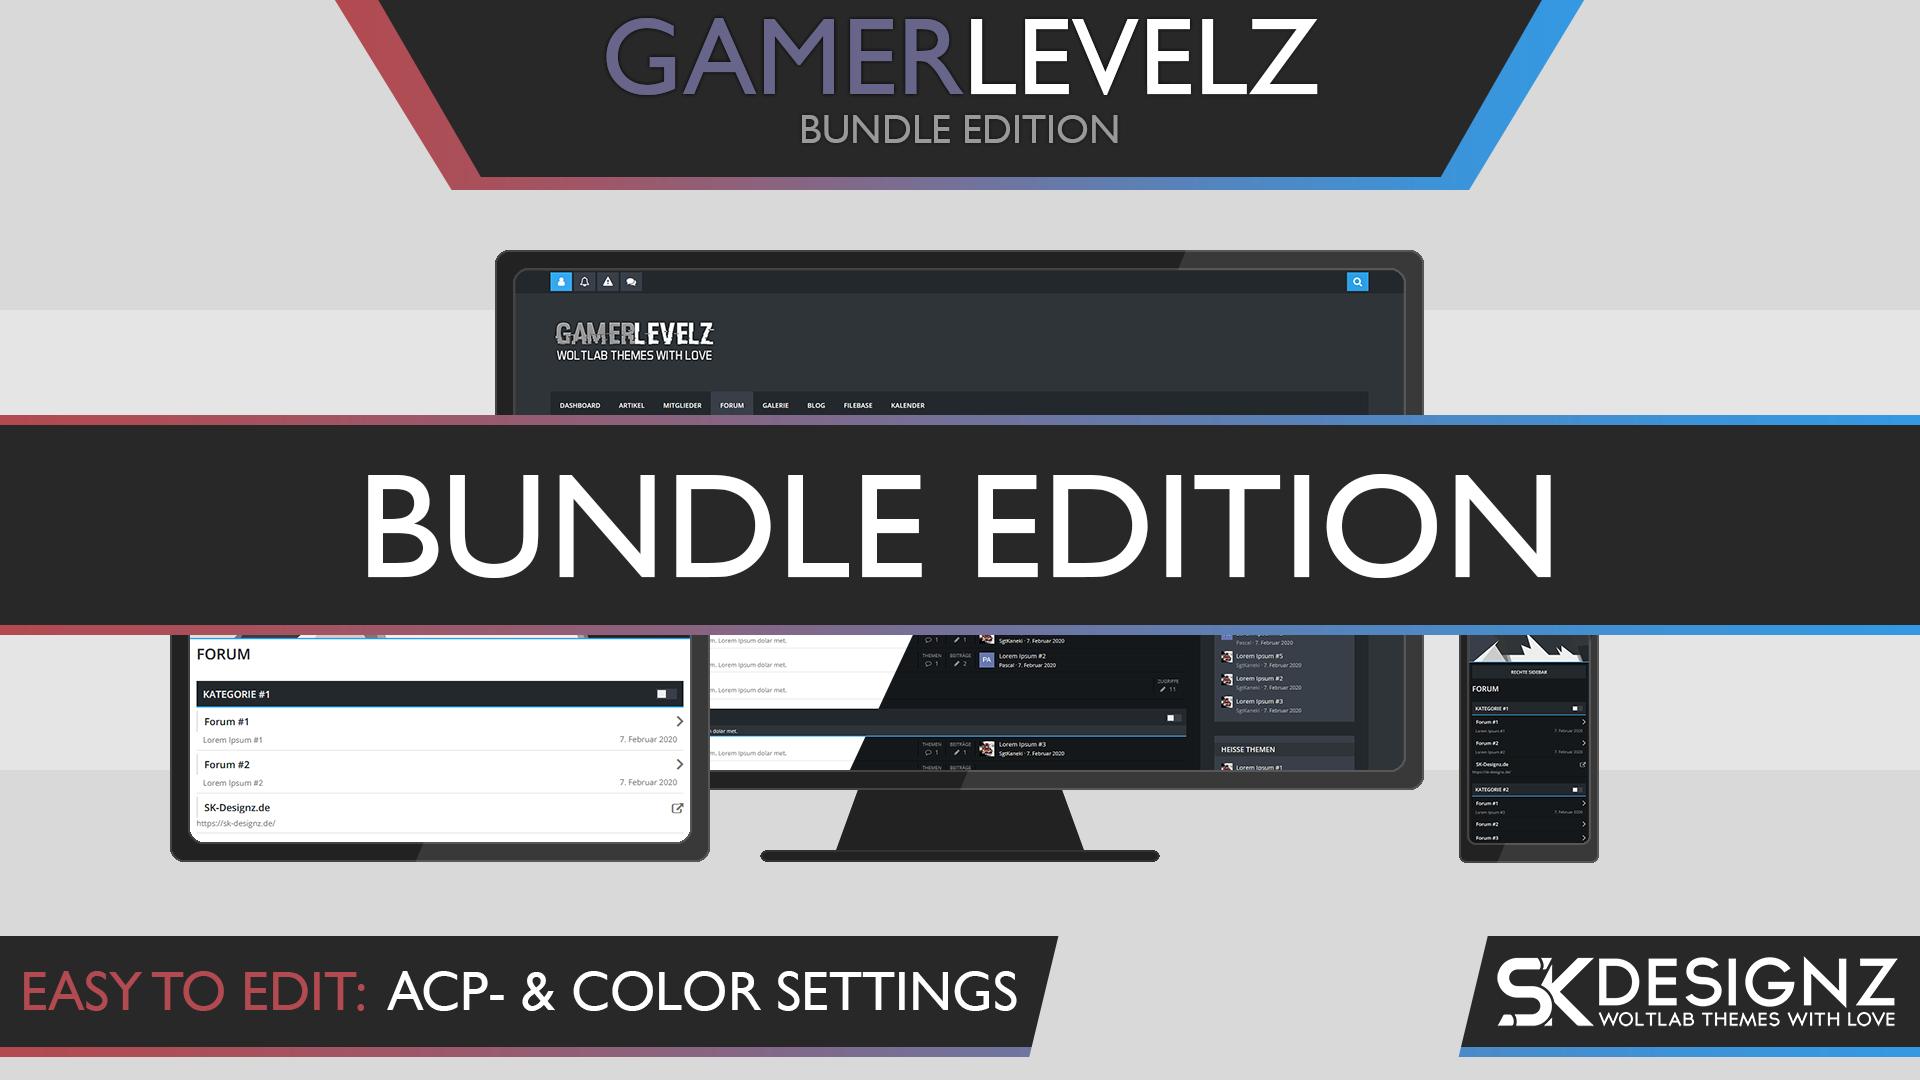 GamerLevelz - Bundle Edition